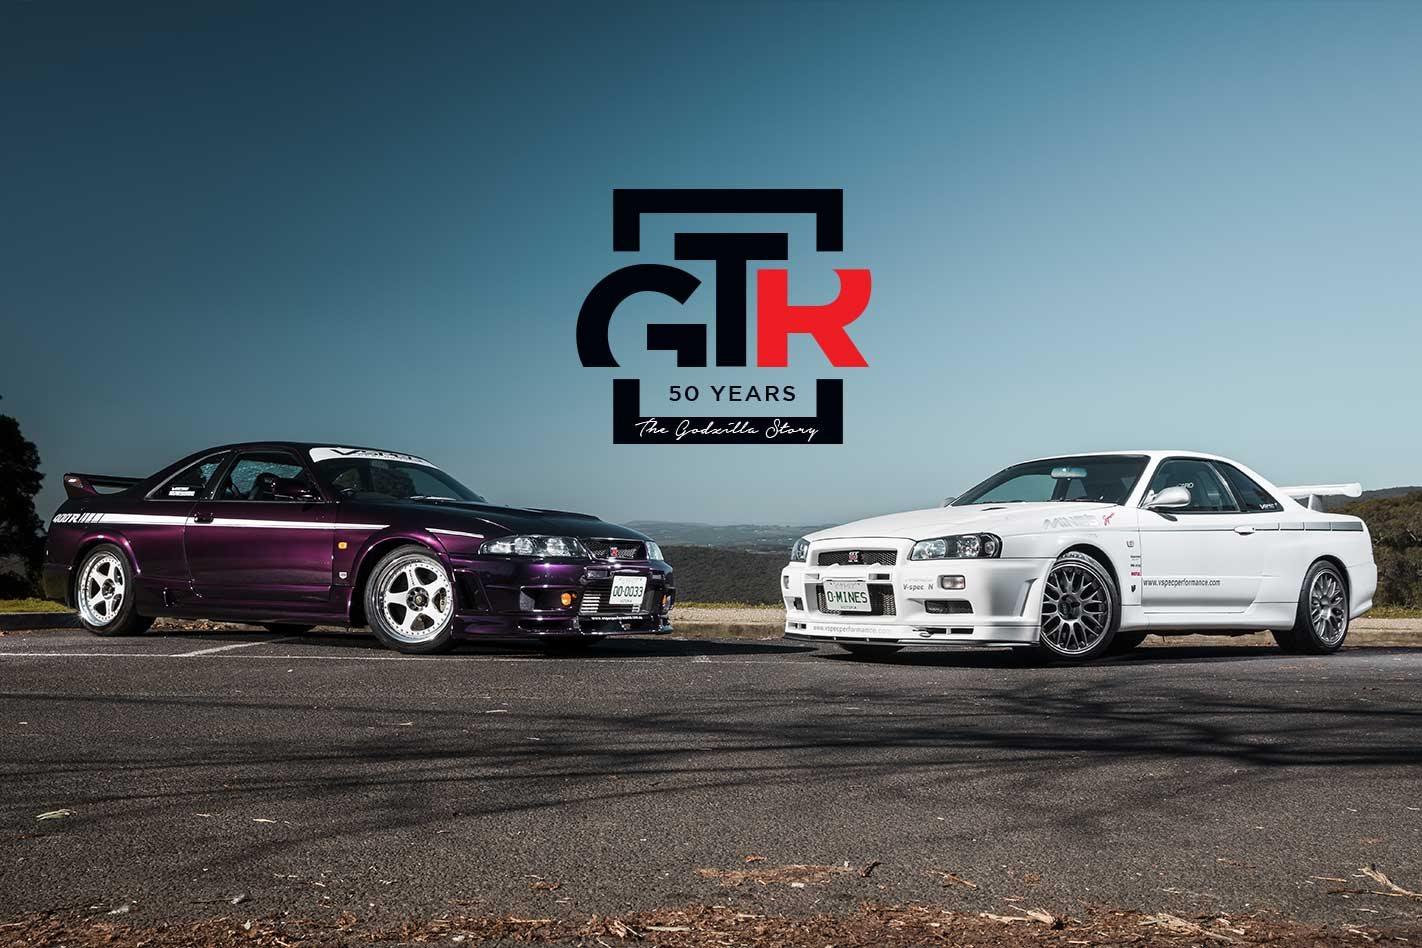 Nismo Skyline 400R vs Mine's R34 Skyline GT-R comparison review: 50 Years of GT-R